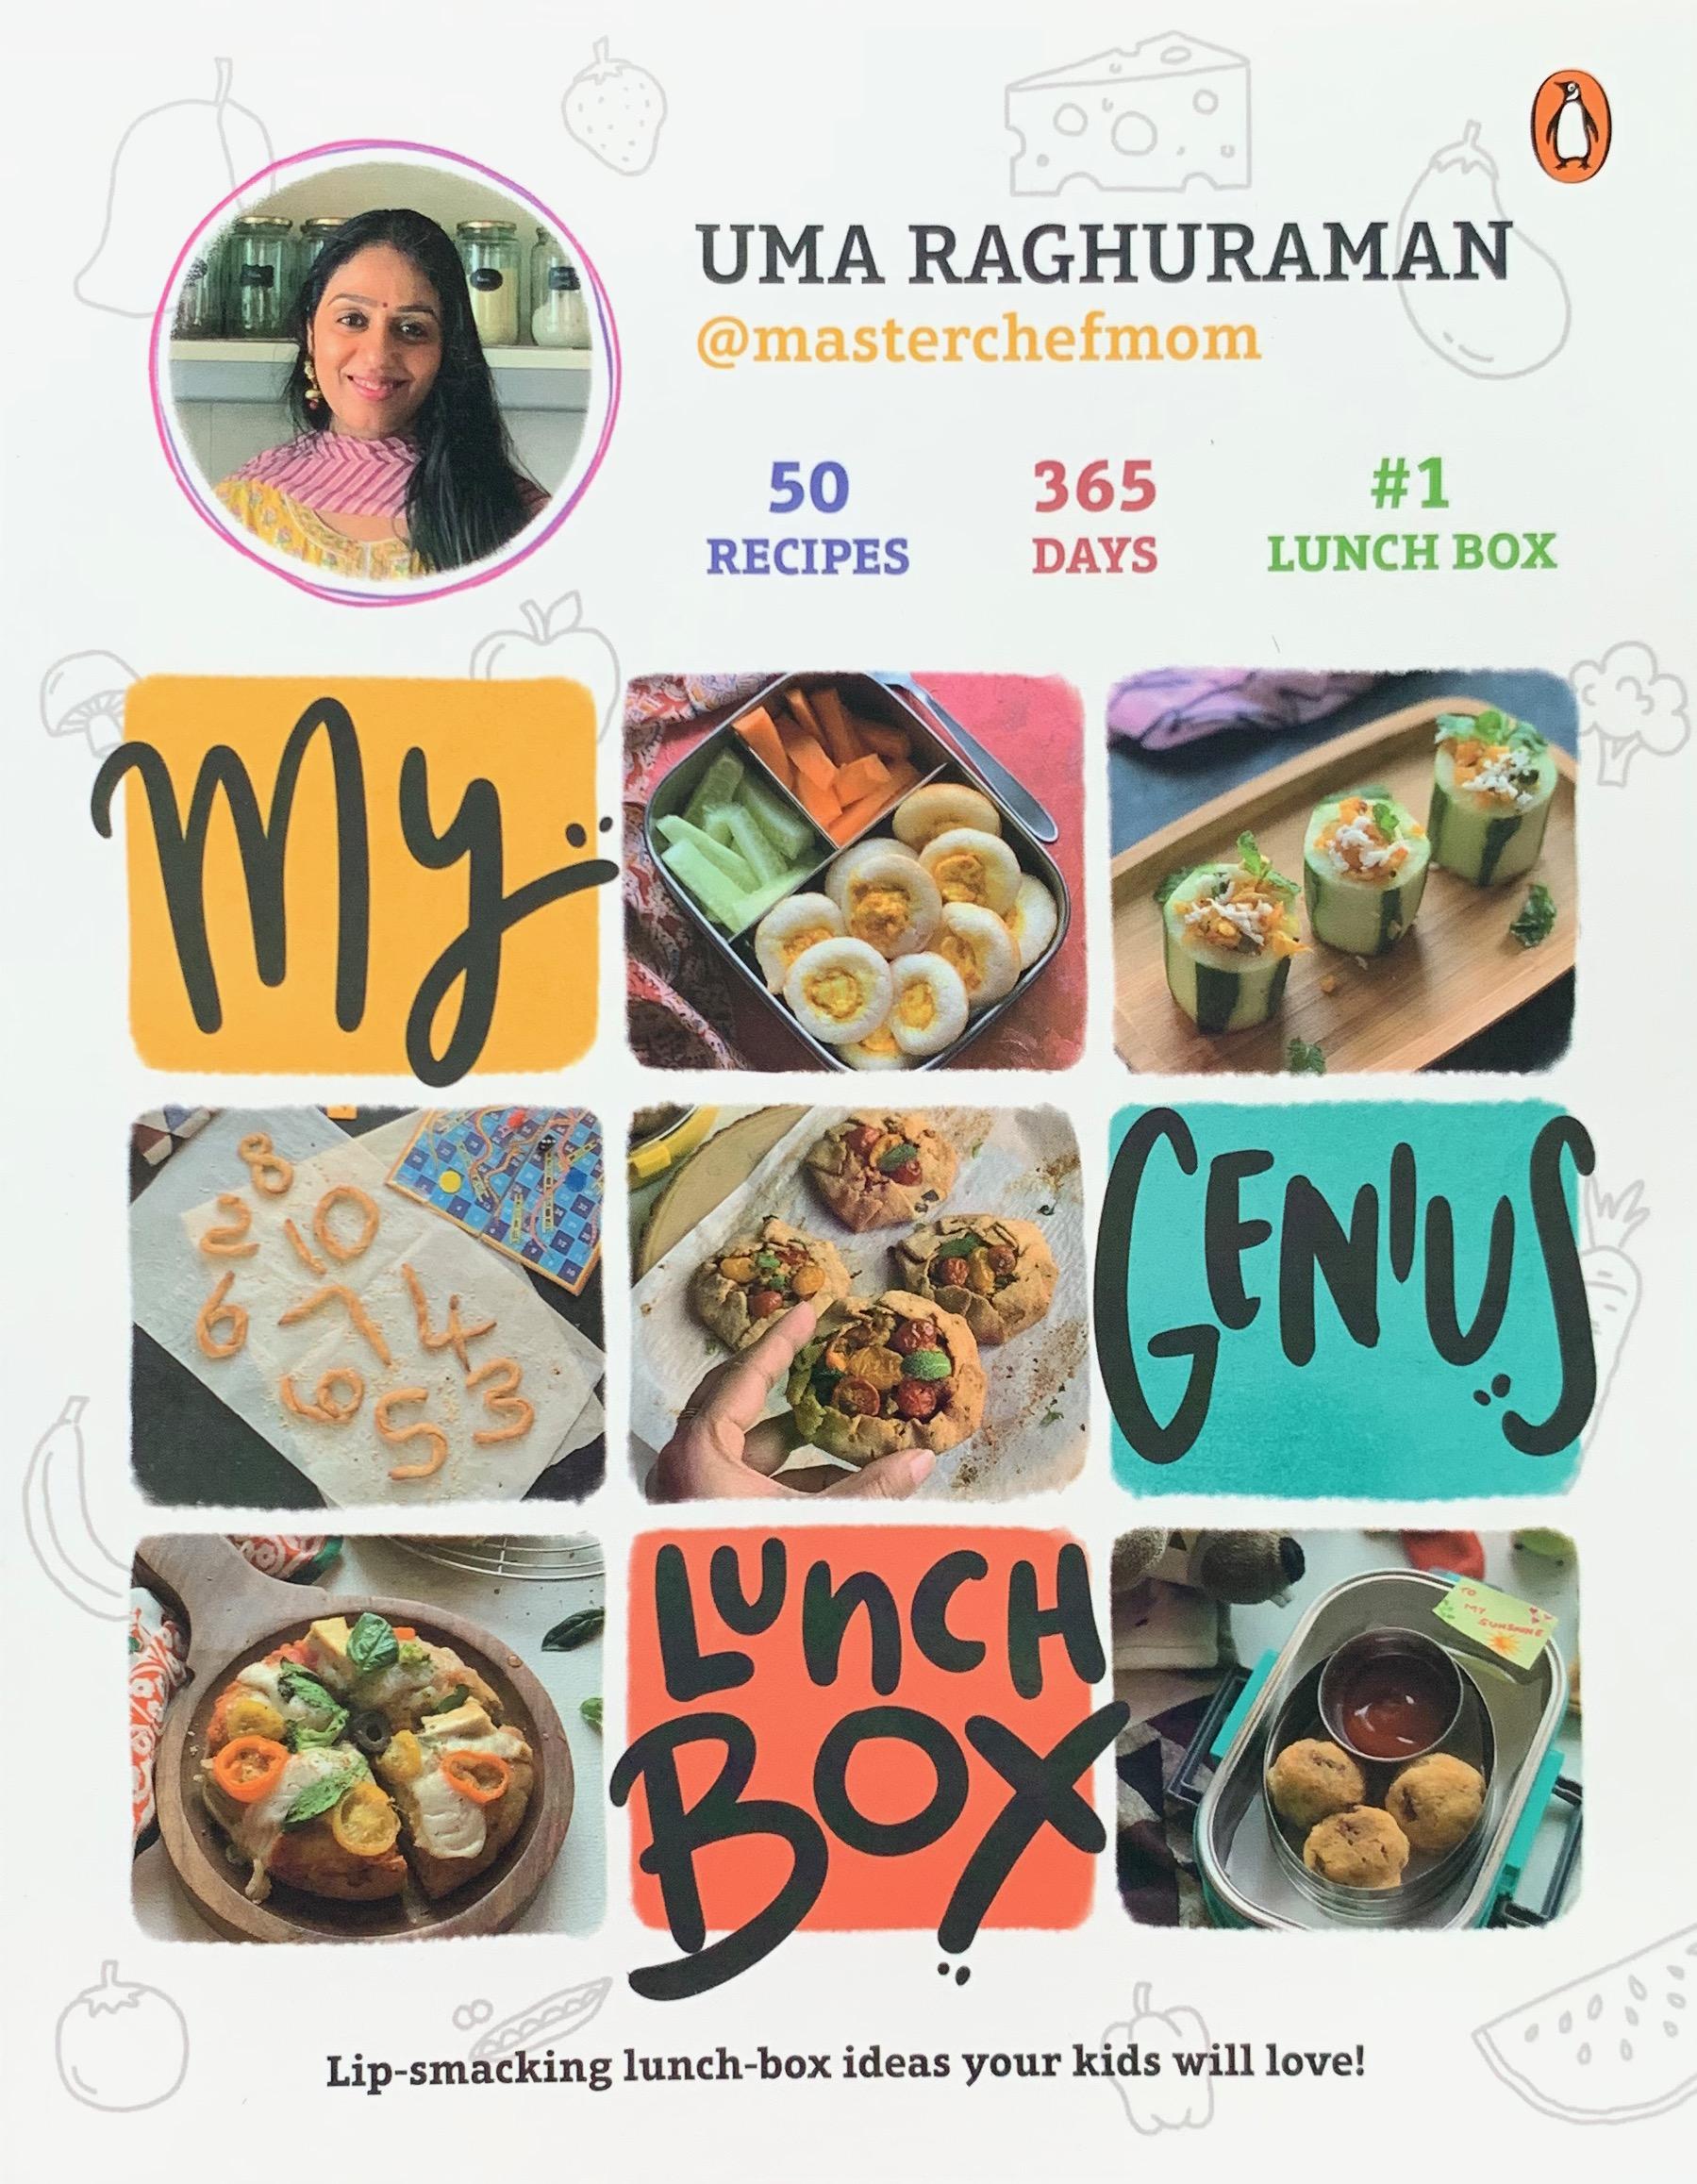 My Genius Lunch Box by Uma Raghuraman